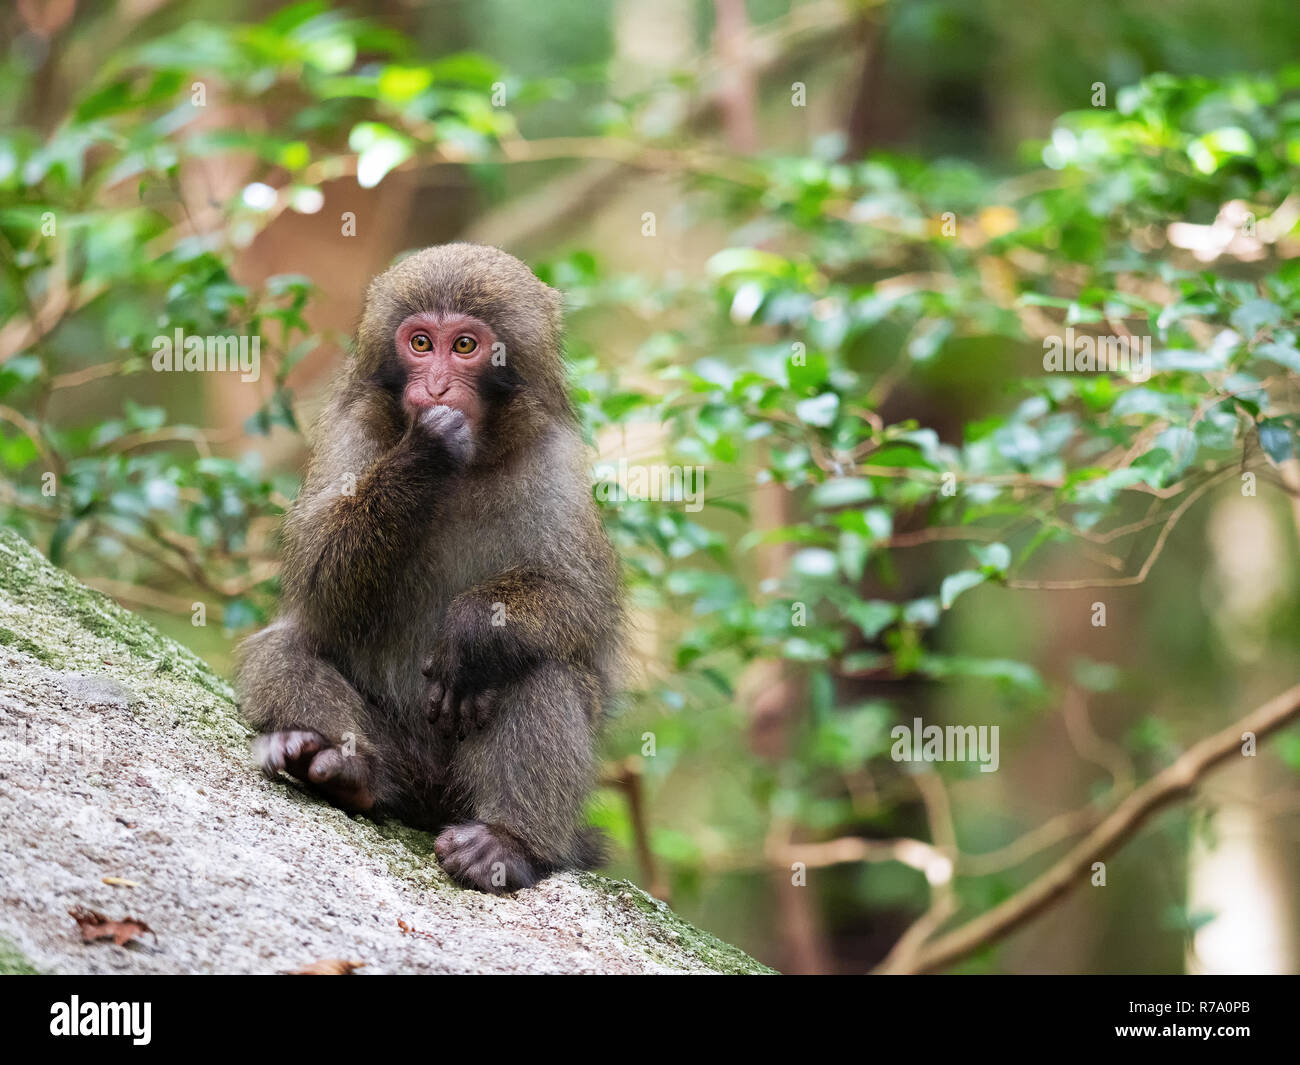 Yakushima macaques (Macaca fuscata yakui) in woodland in Western Yakushima, Japan. Stock Photo